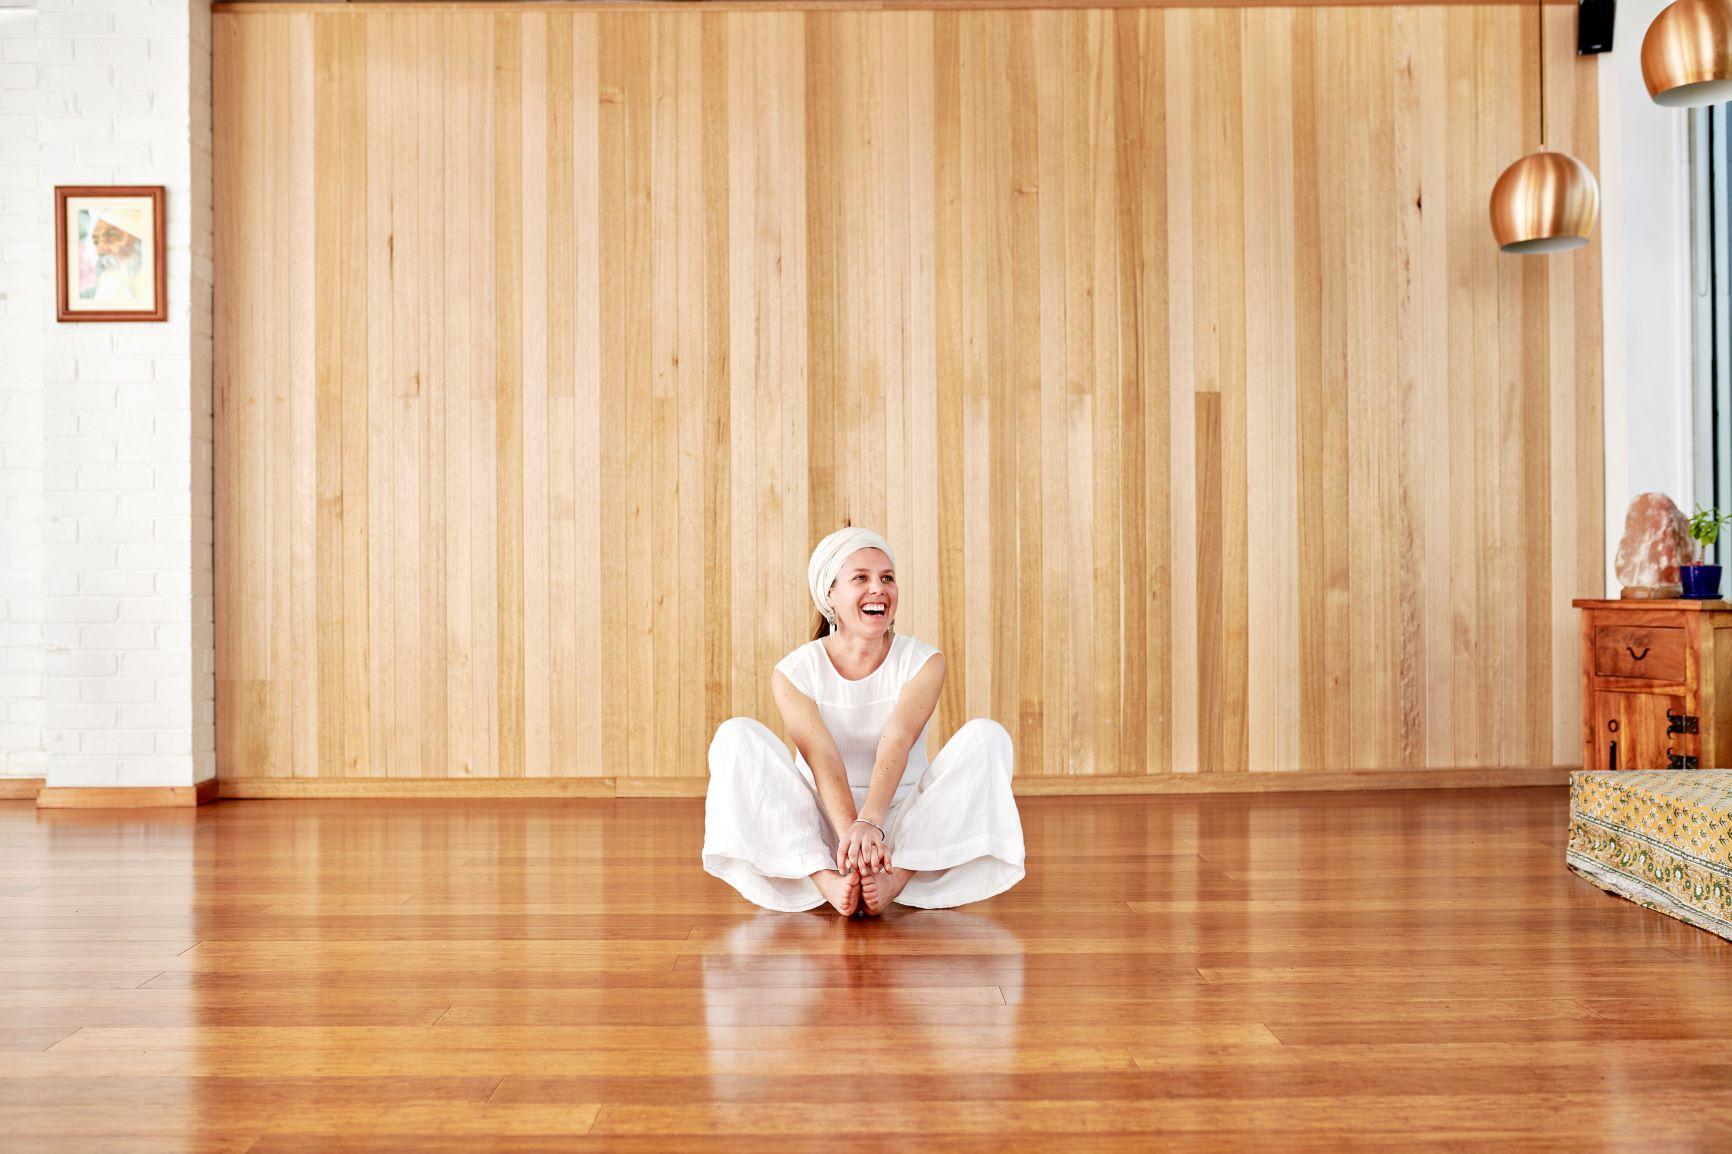 Blog post Joanna nation yoga teacher kundalini house fitzroy north